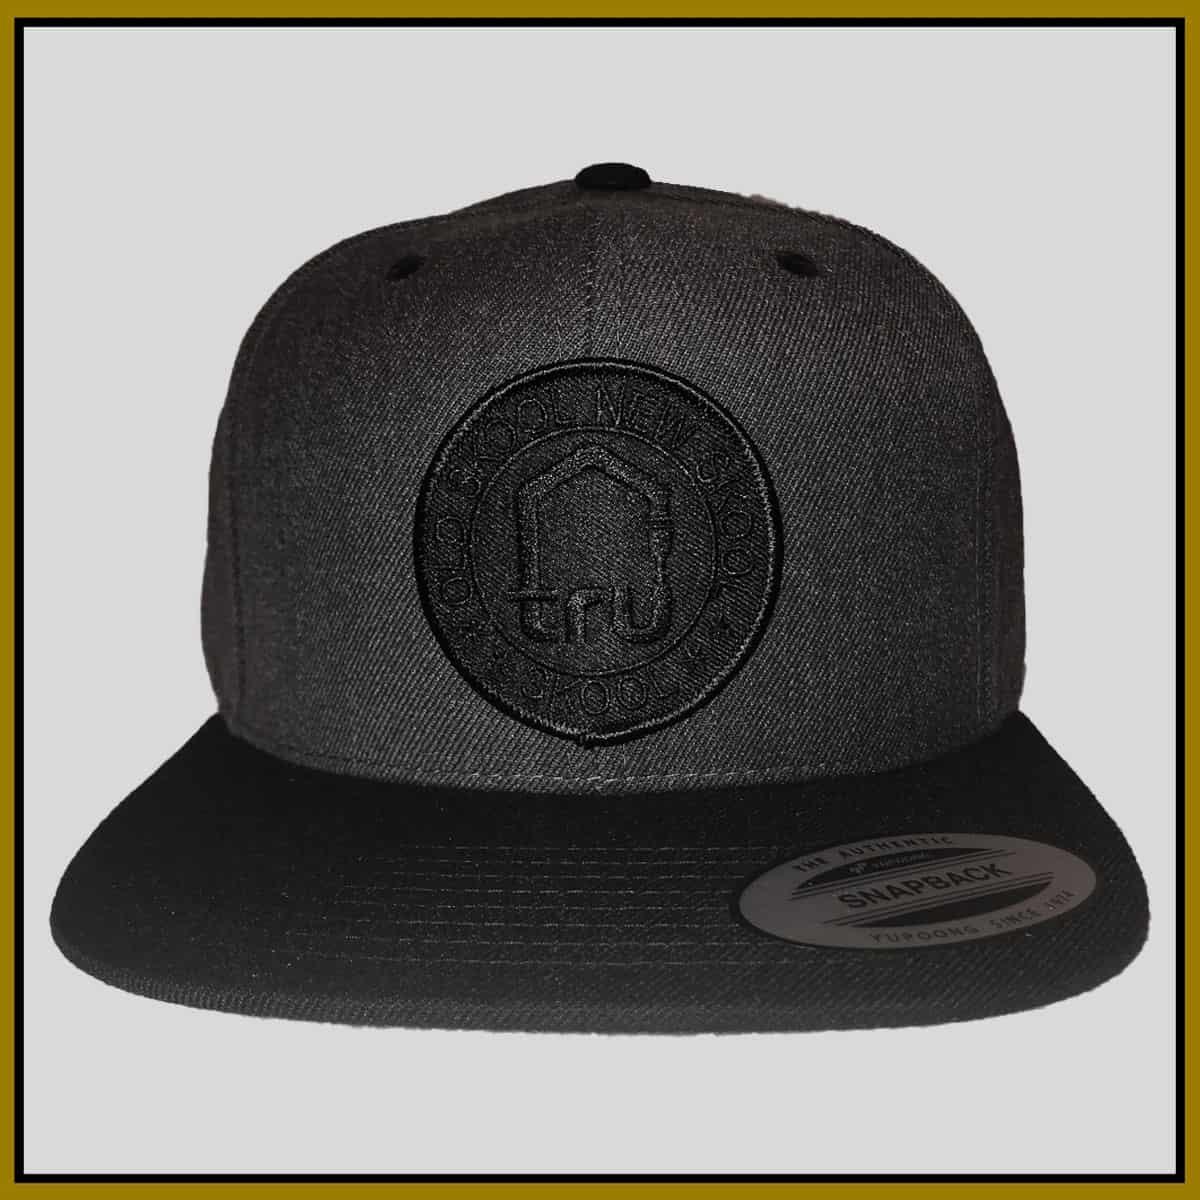 TRU Skool Black/Dark Grey Snapback